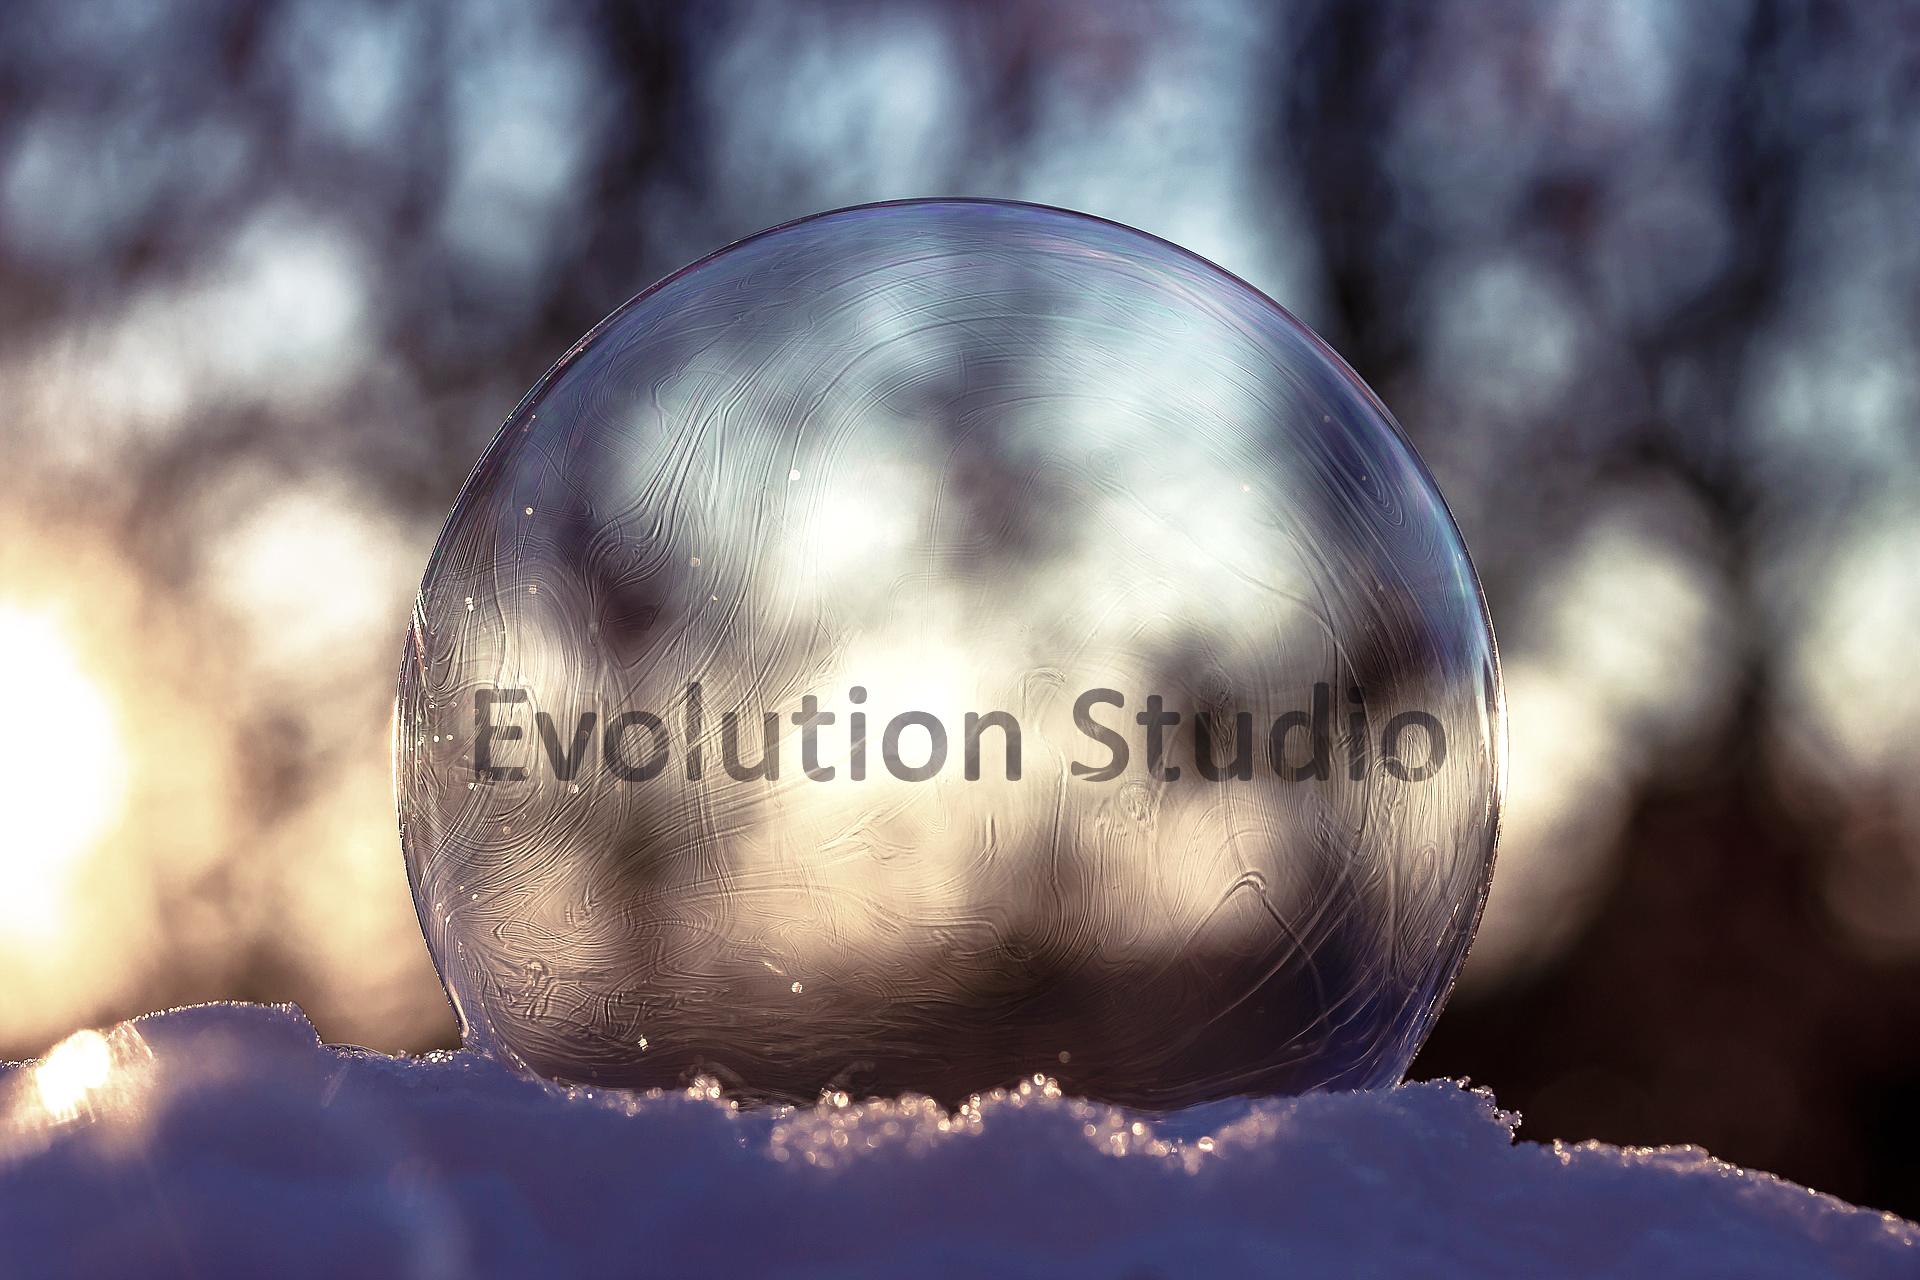 Evolution Studio, заморожен